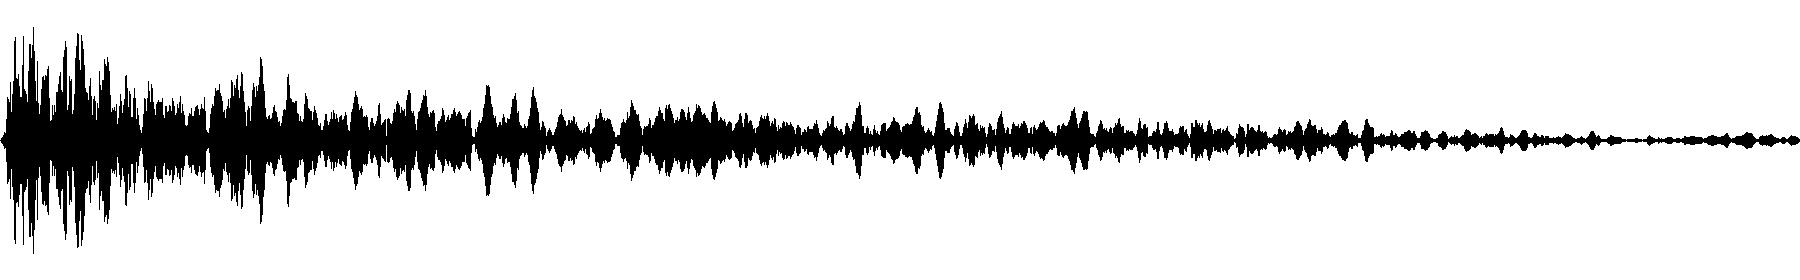 vedh synth cut 193 dm